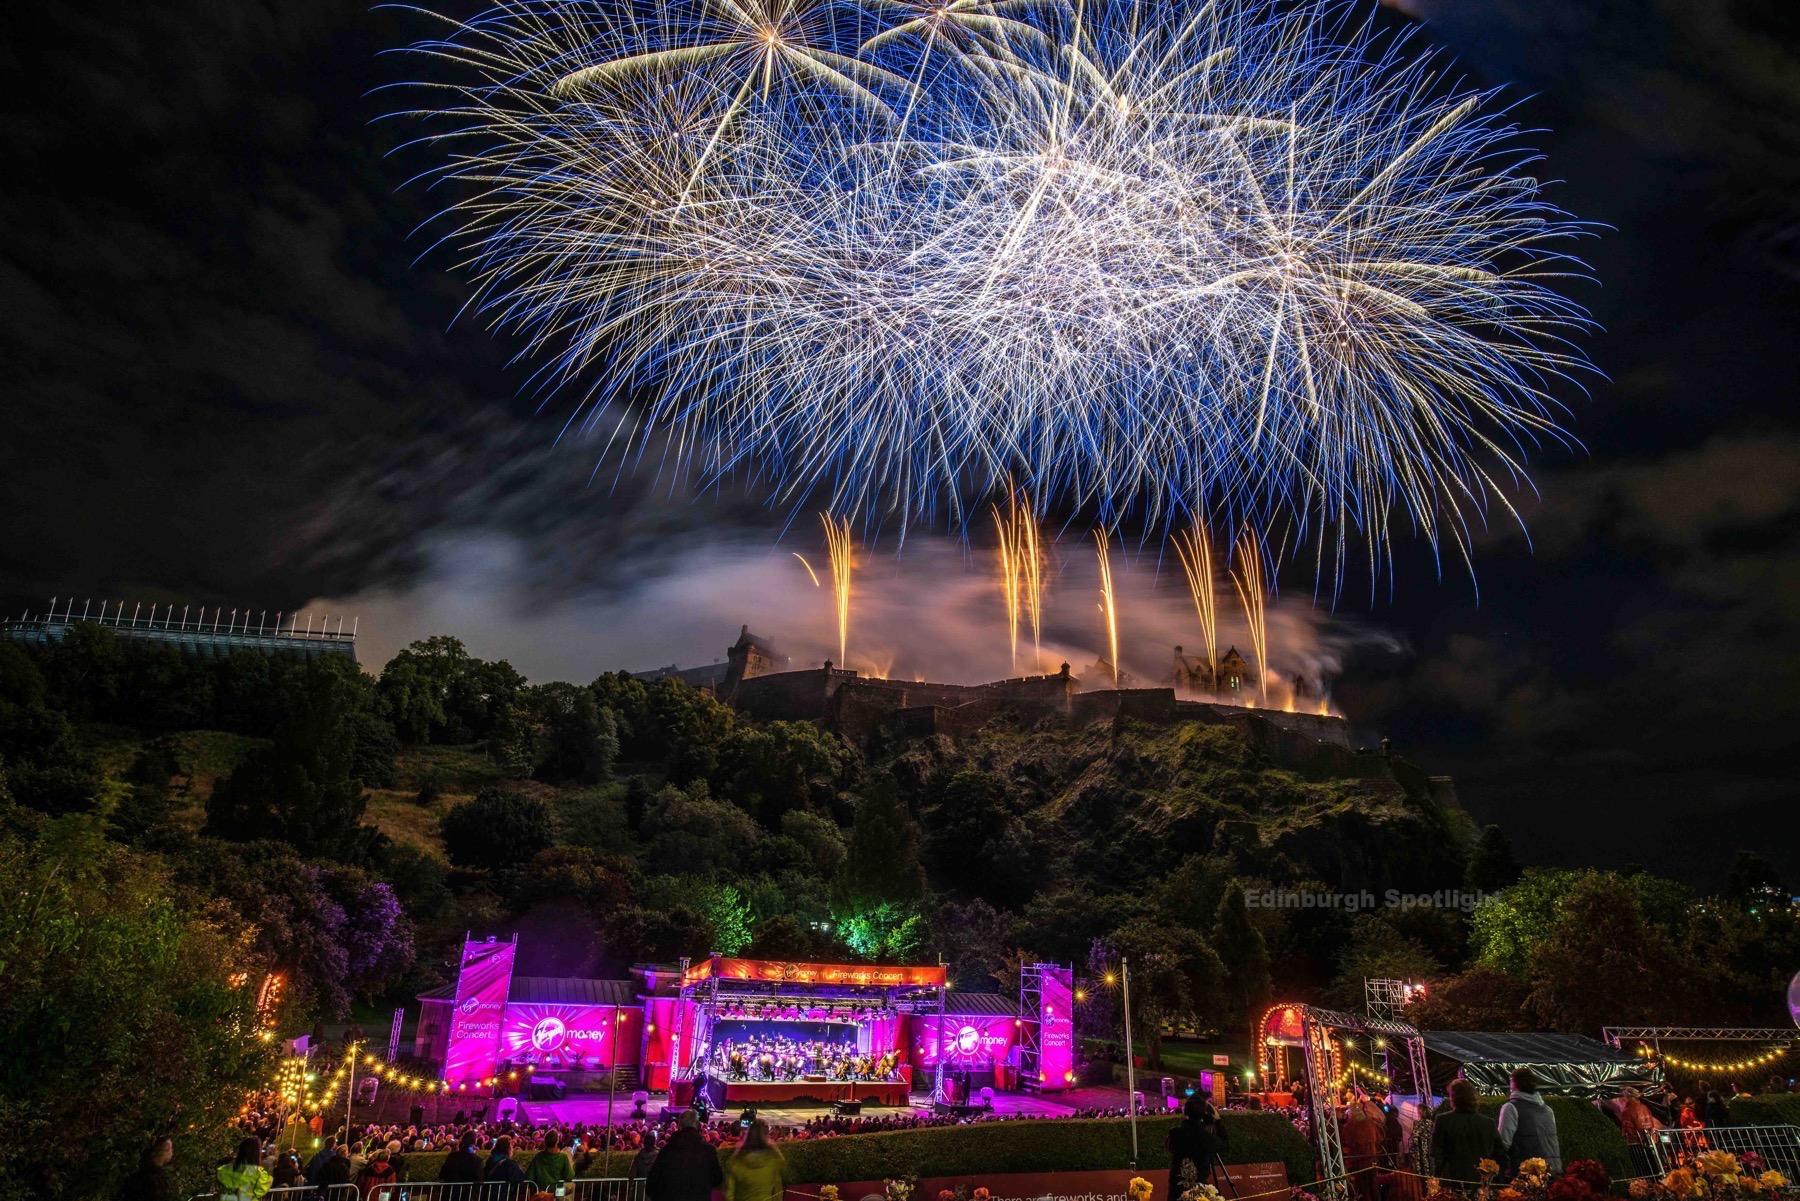 Image result for edinburgh fireworks